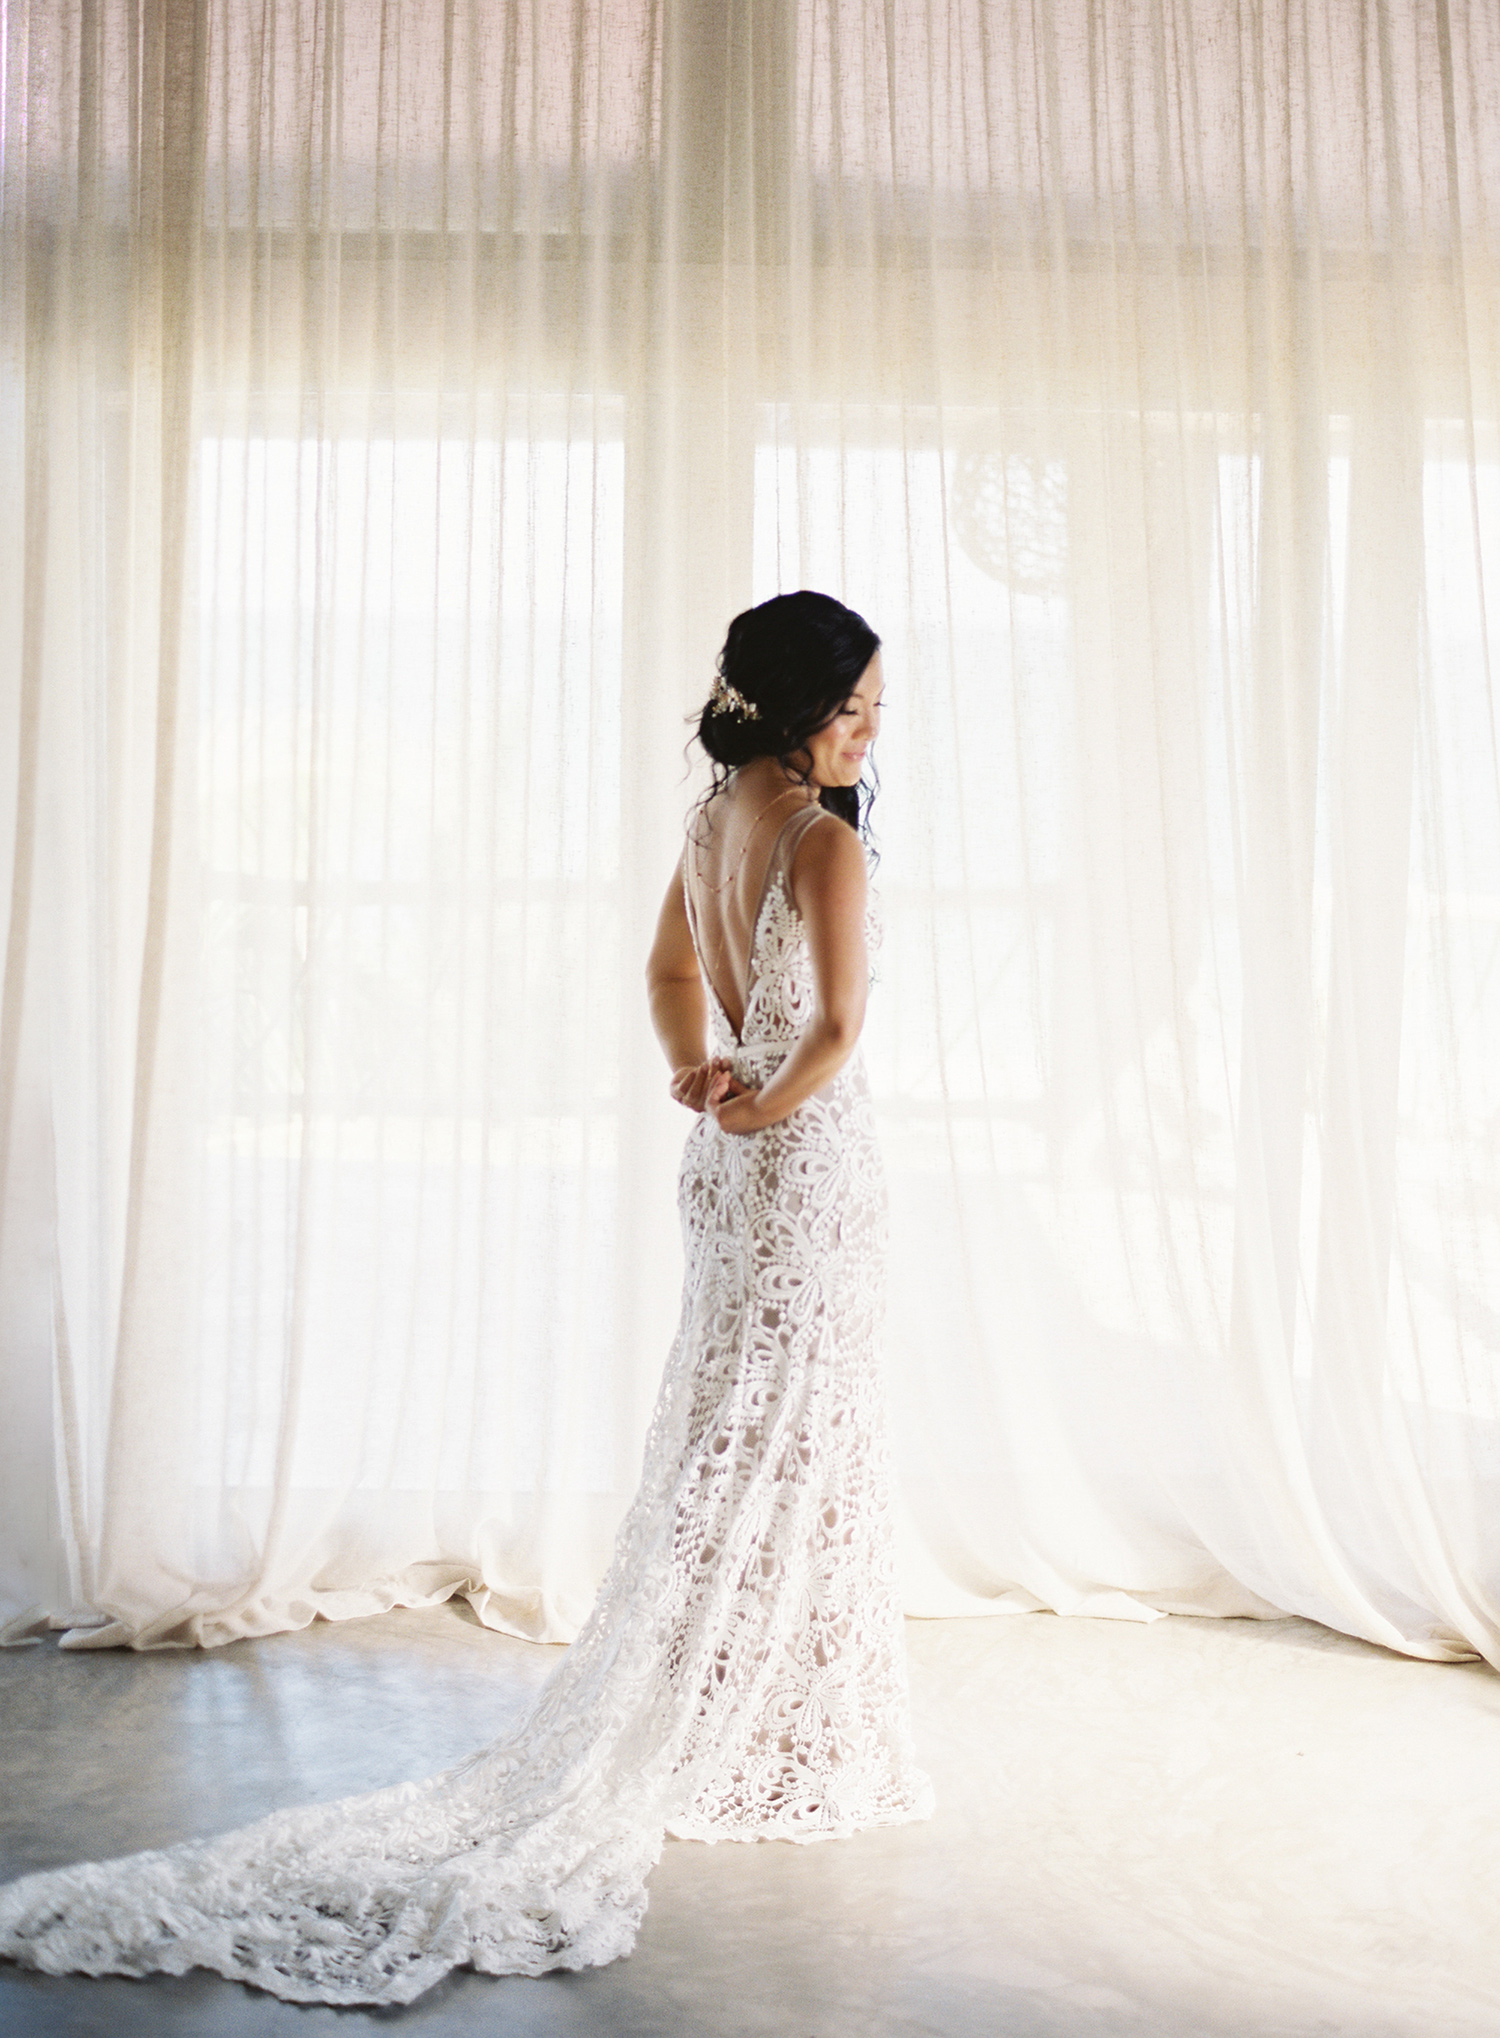 portrait sophie back view wedding dress